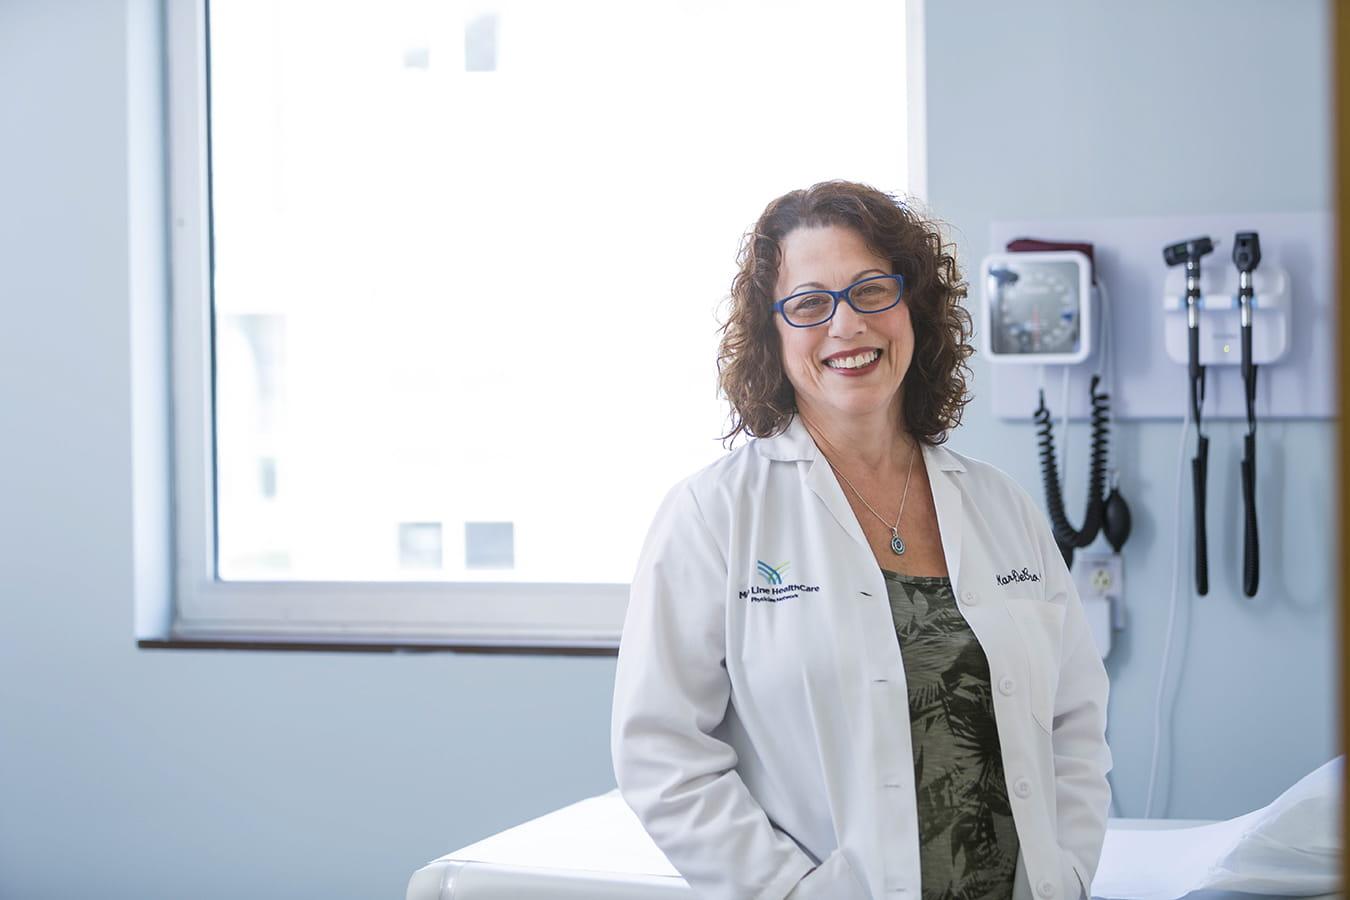 News – Mary De Caro, MD, to open Main Line HealthCare